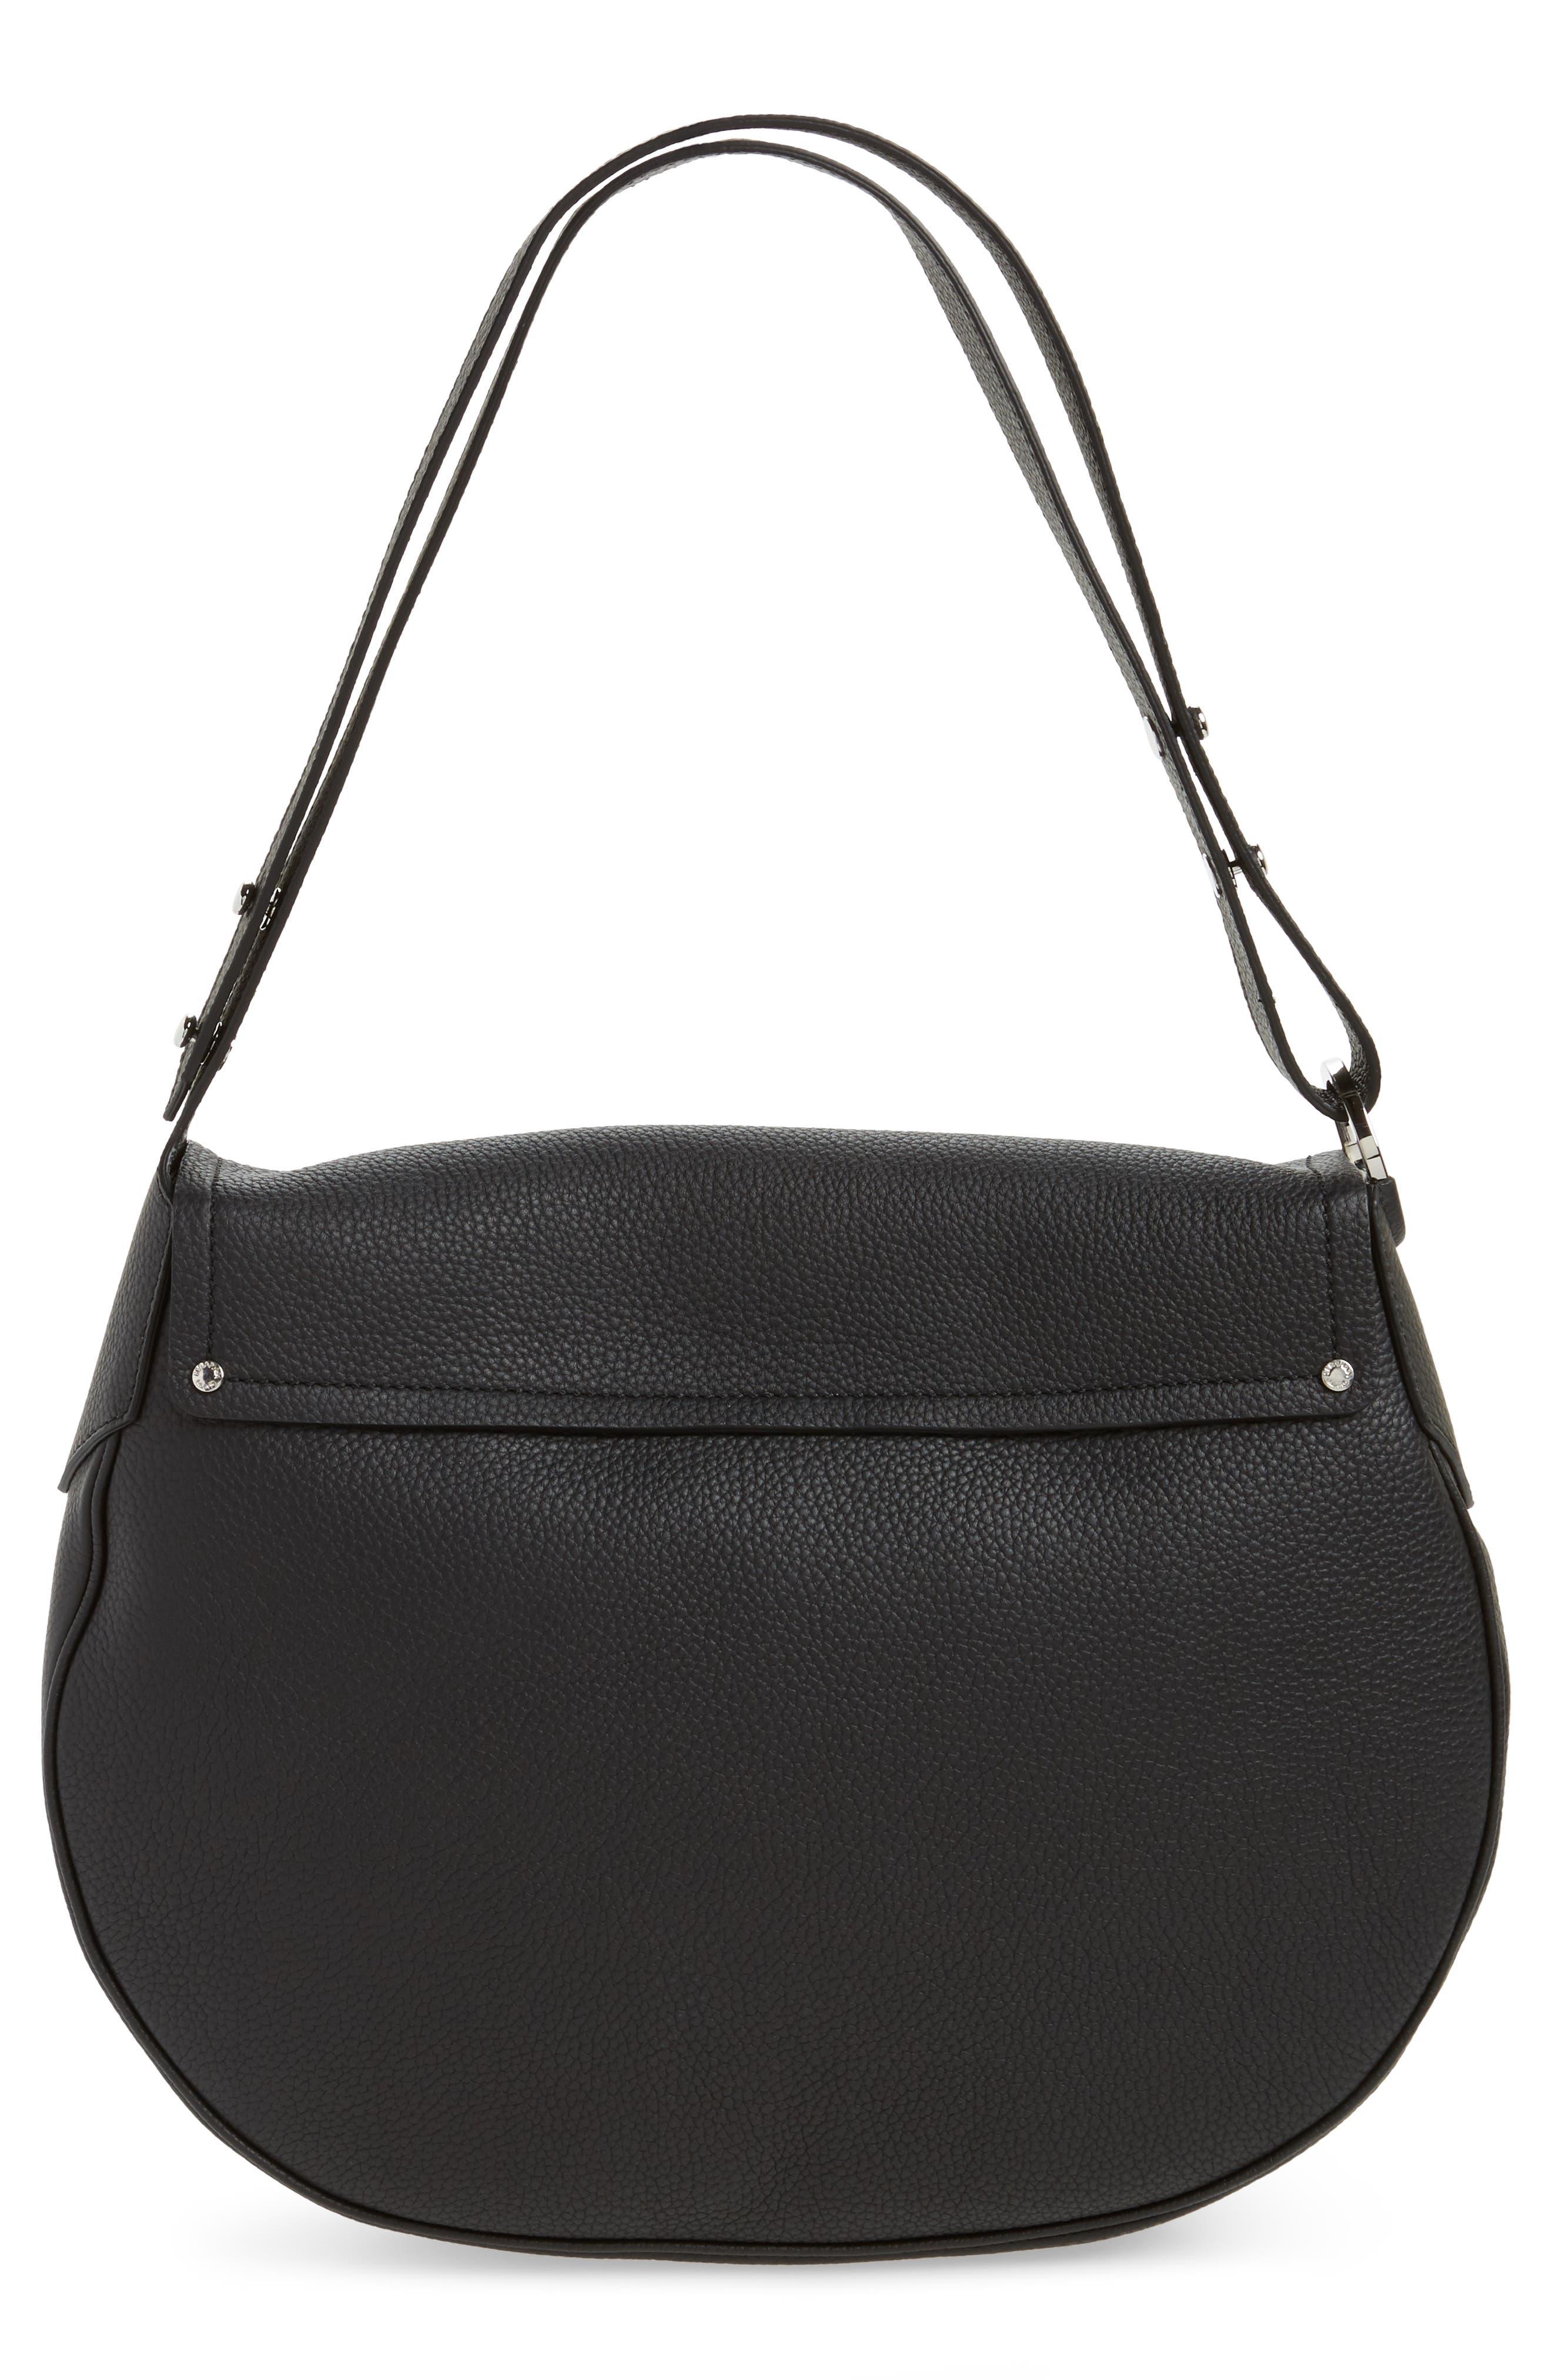 Valeria Cachemire Leather Saddle Bag,                             Alternate thumbnail 3, color,                             001